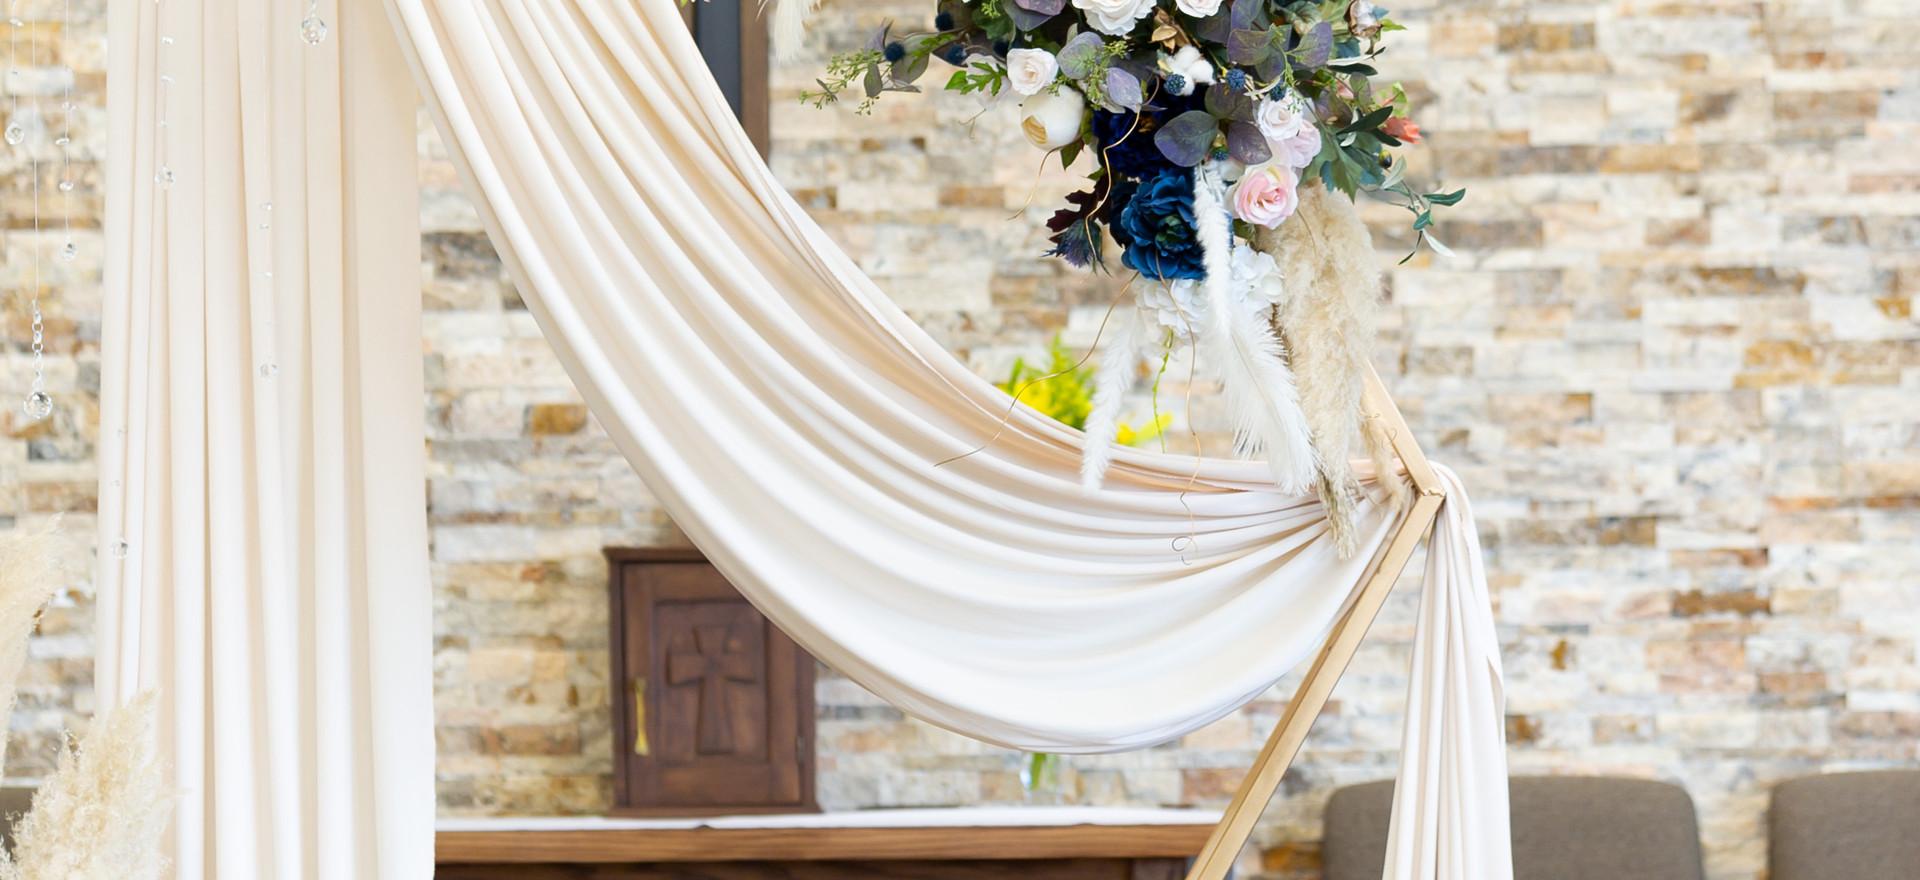 038_Lorena and Mike's Wedding day.jpg